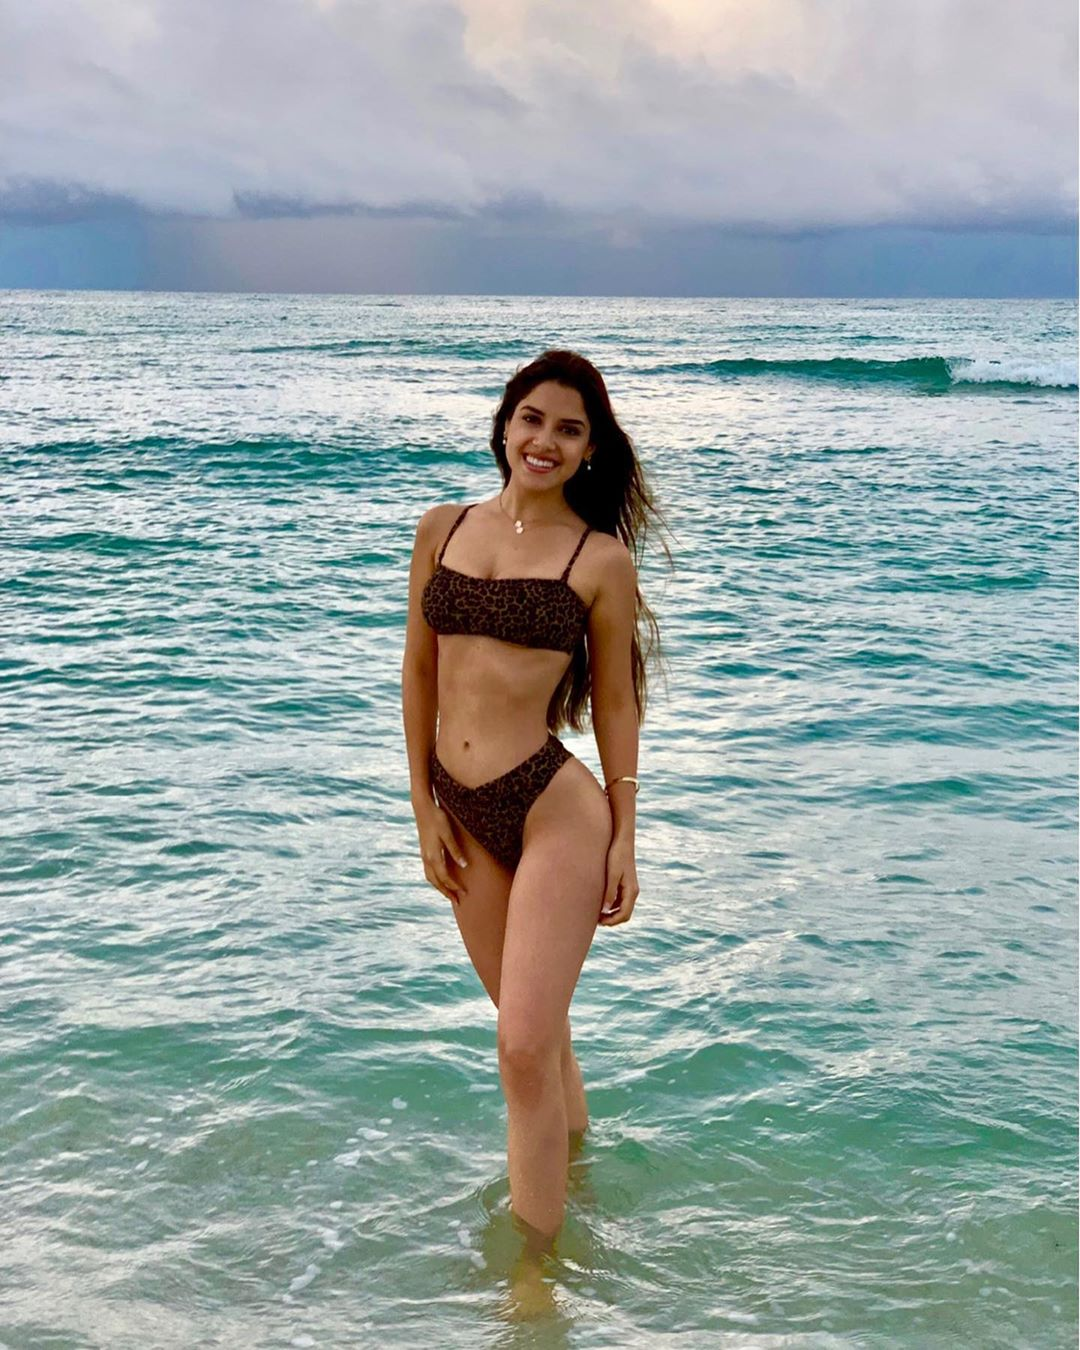 angella escudero, miss world peru 2019. - Página 2 72331910